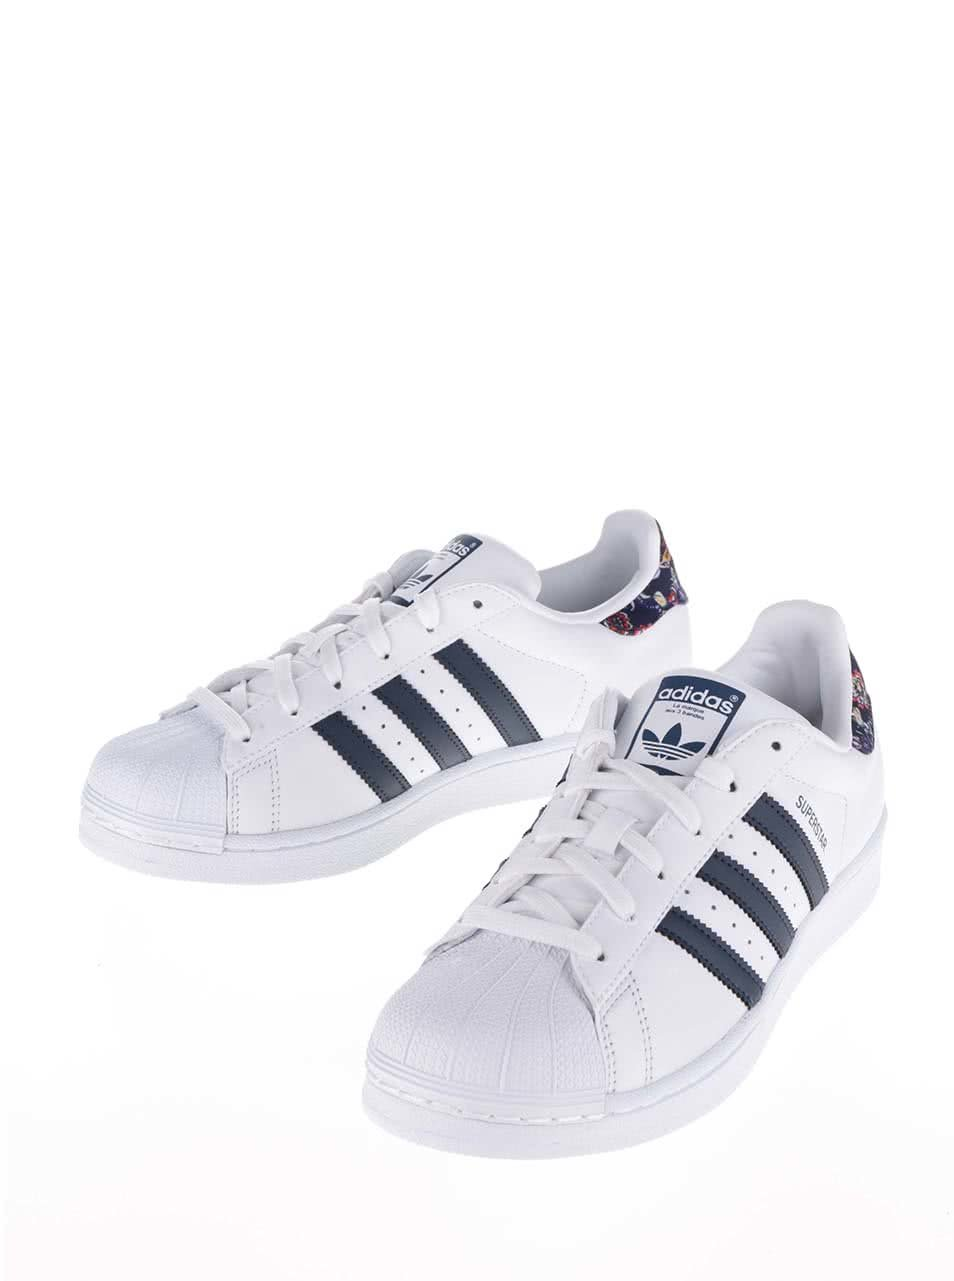 Biele dámske tenisky s farebnou pätou adidas Originals Superstar ... d4013c9d182